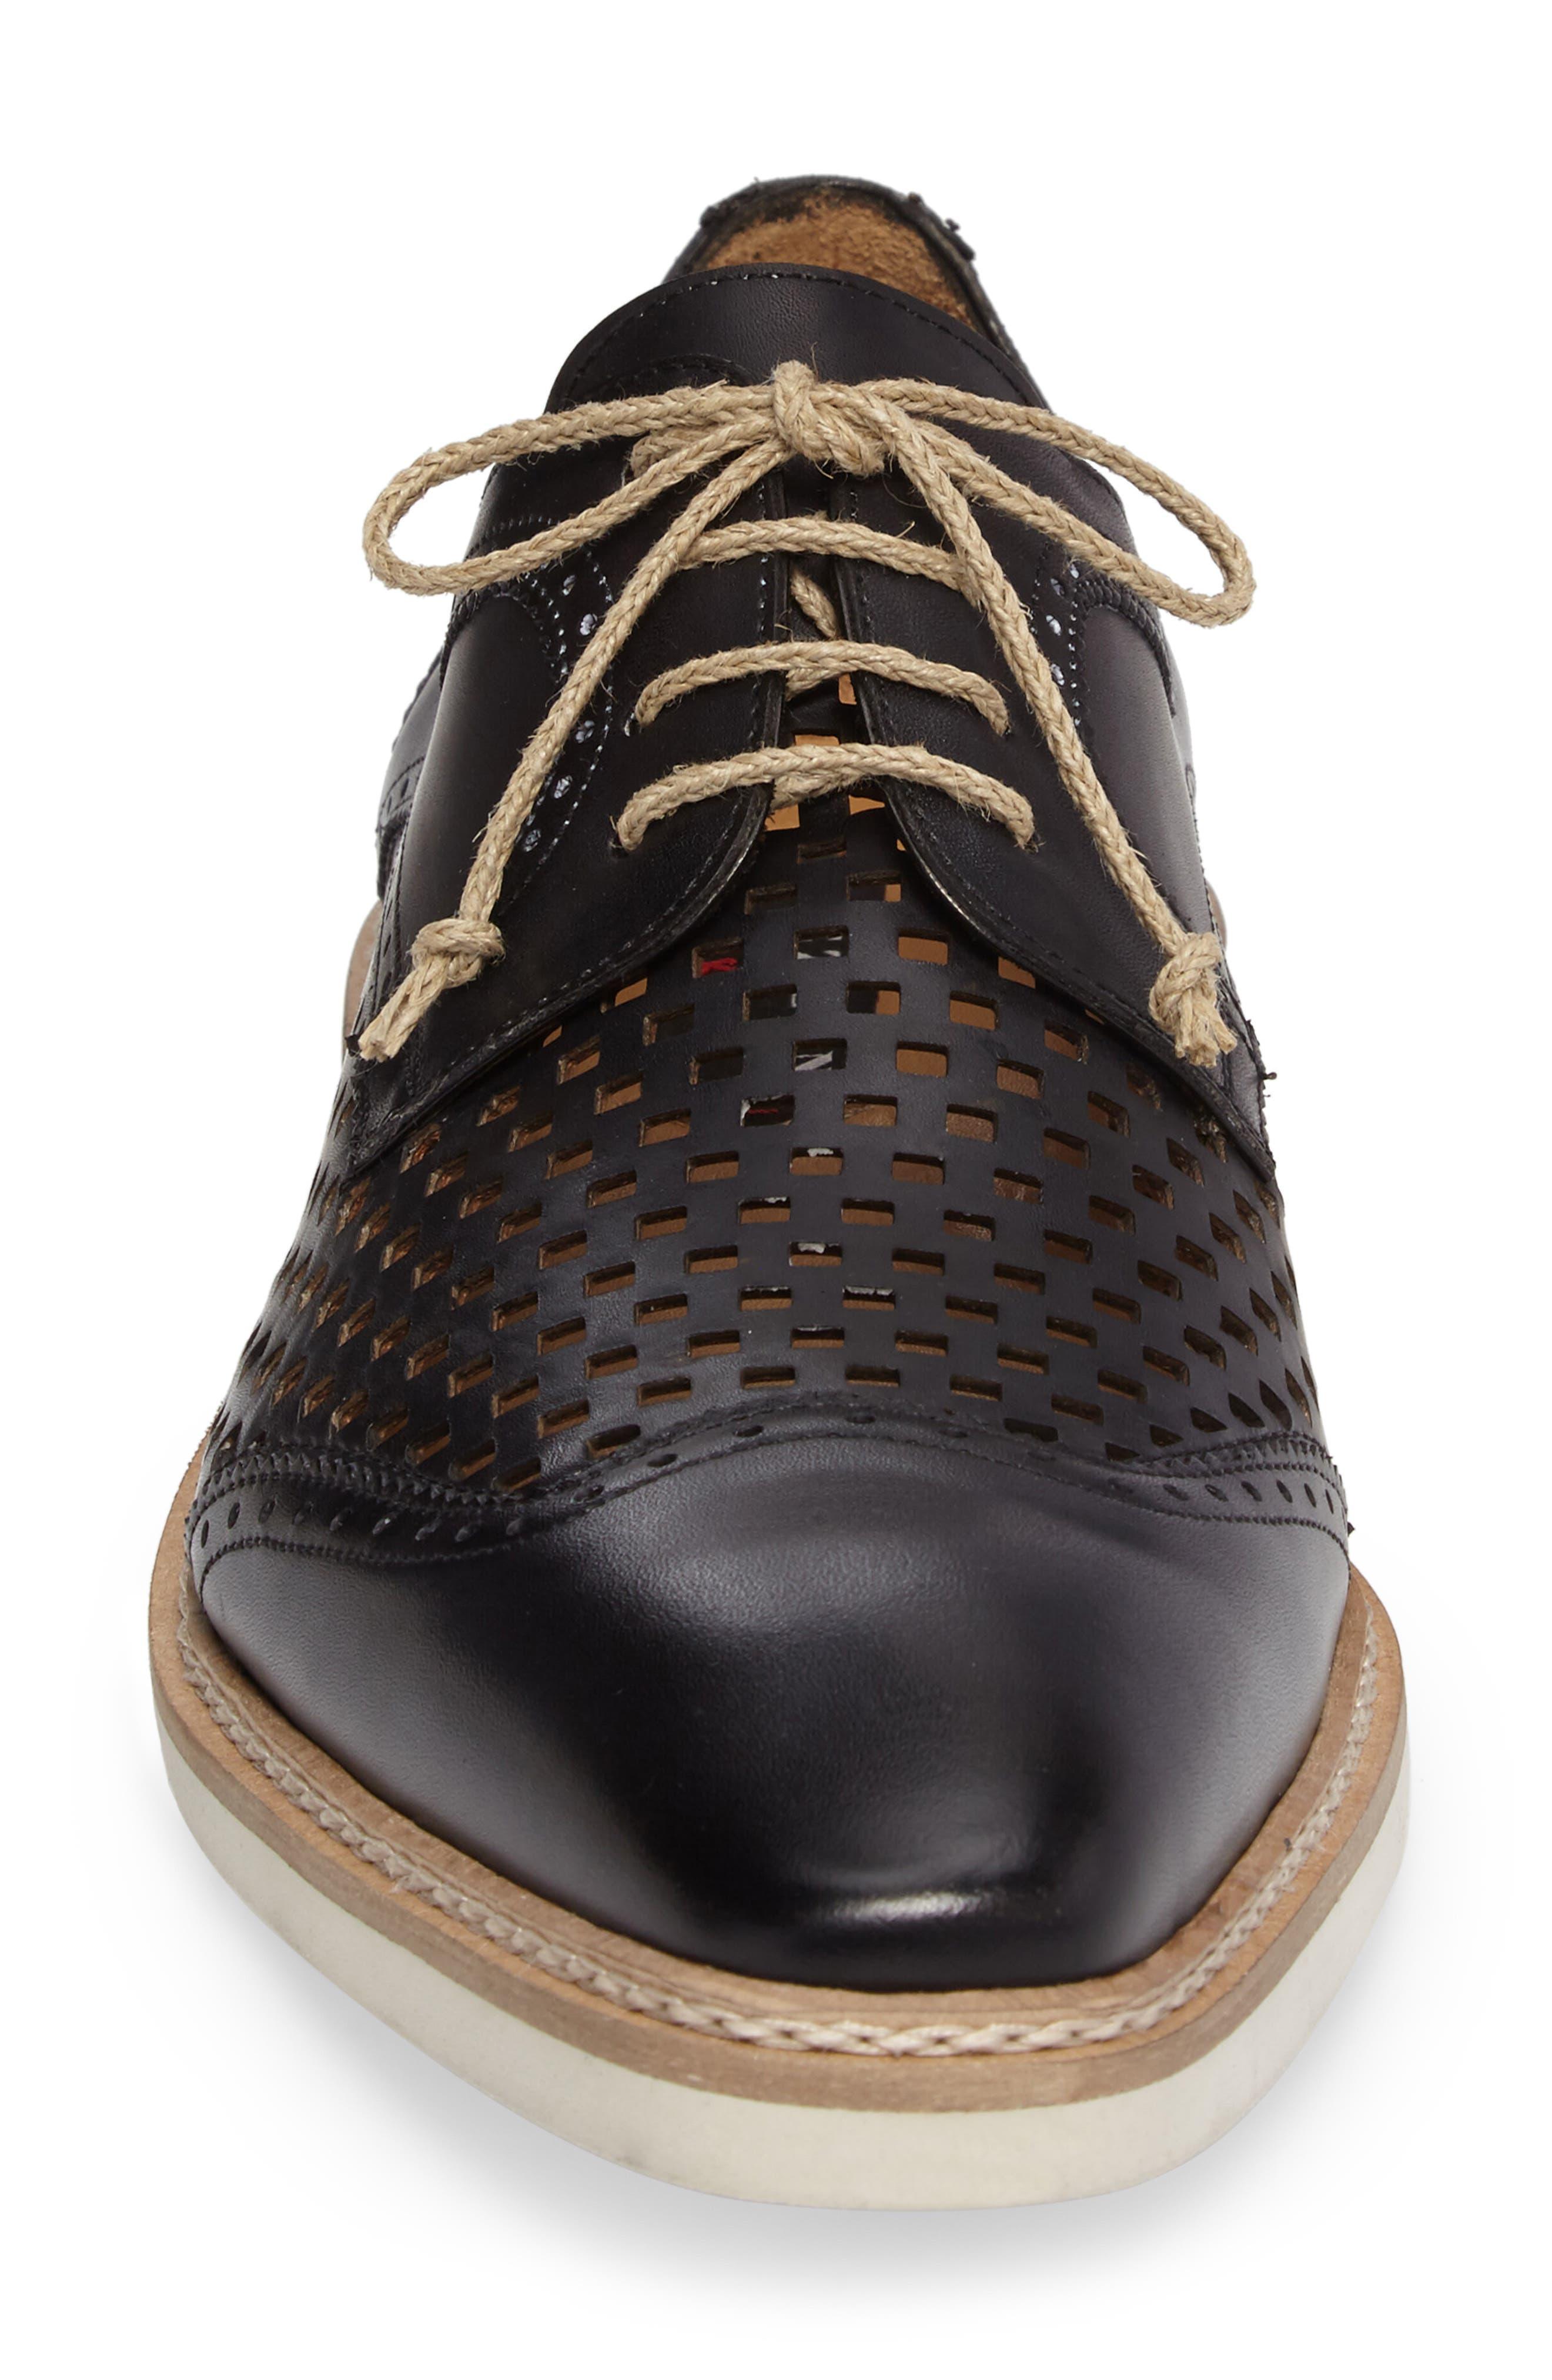 Alvarez Spectator Shoe,                             Alternate thumbnail 4, color,                             001